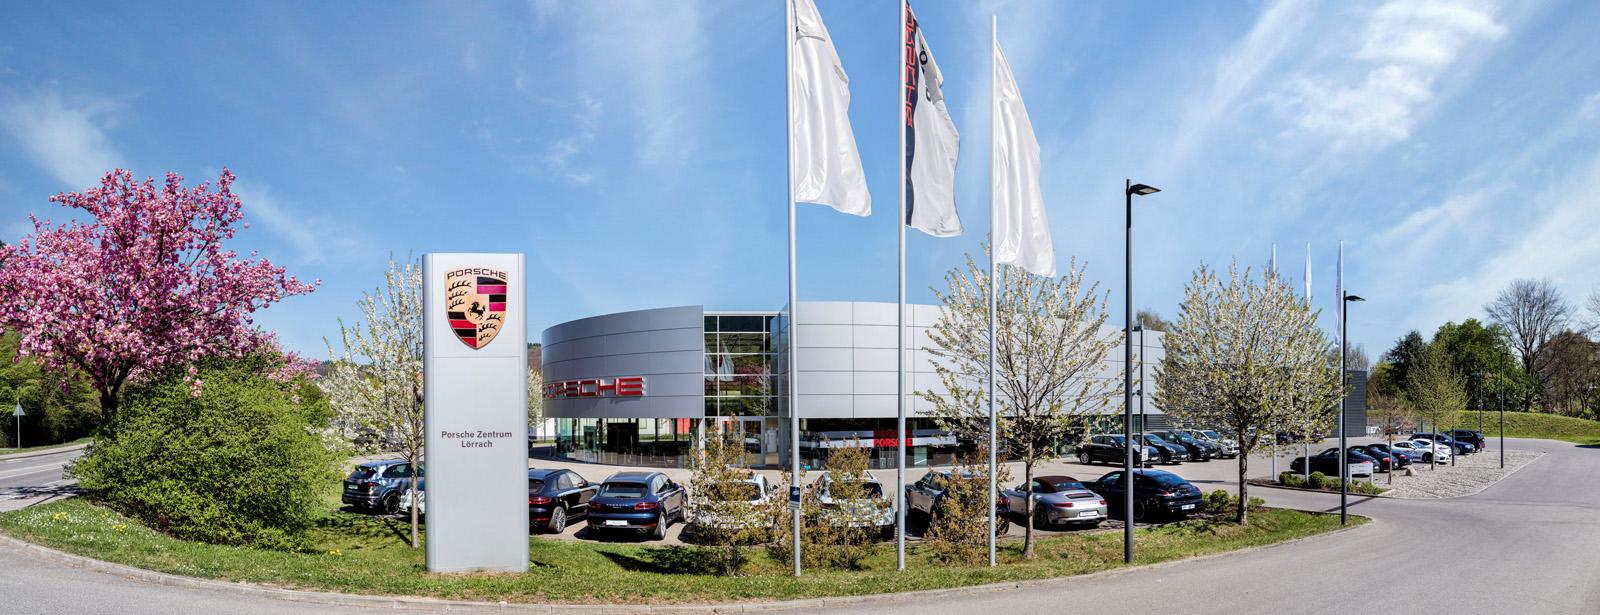 Porsche Centre Lörrach